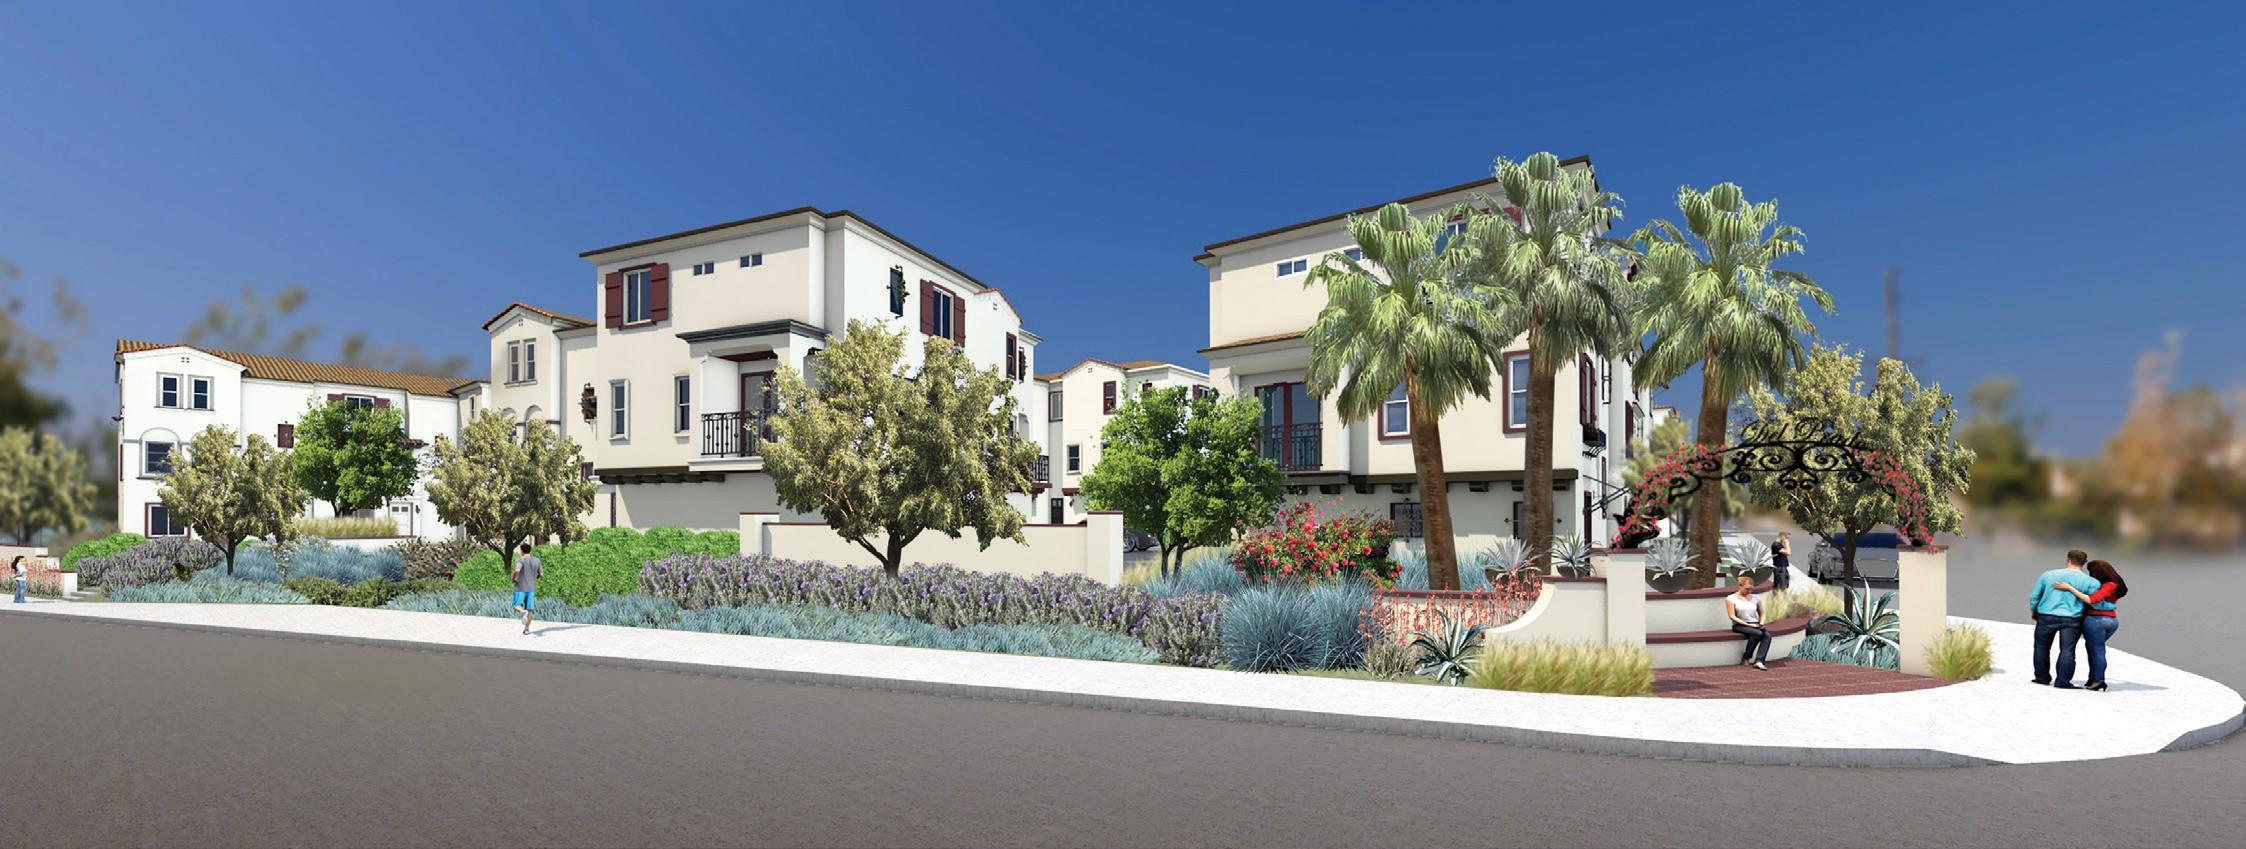 Artist's rendering of homes envisioned for the Del Prado development.